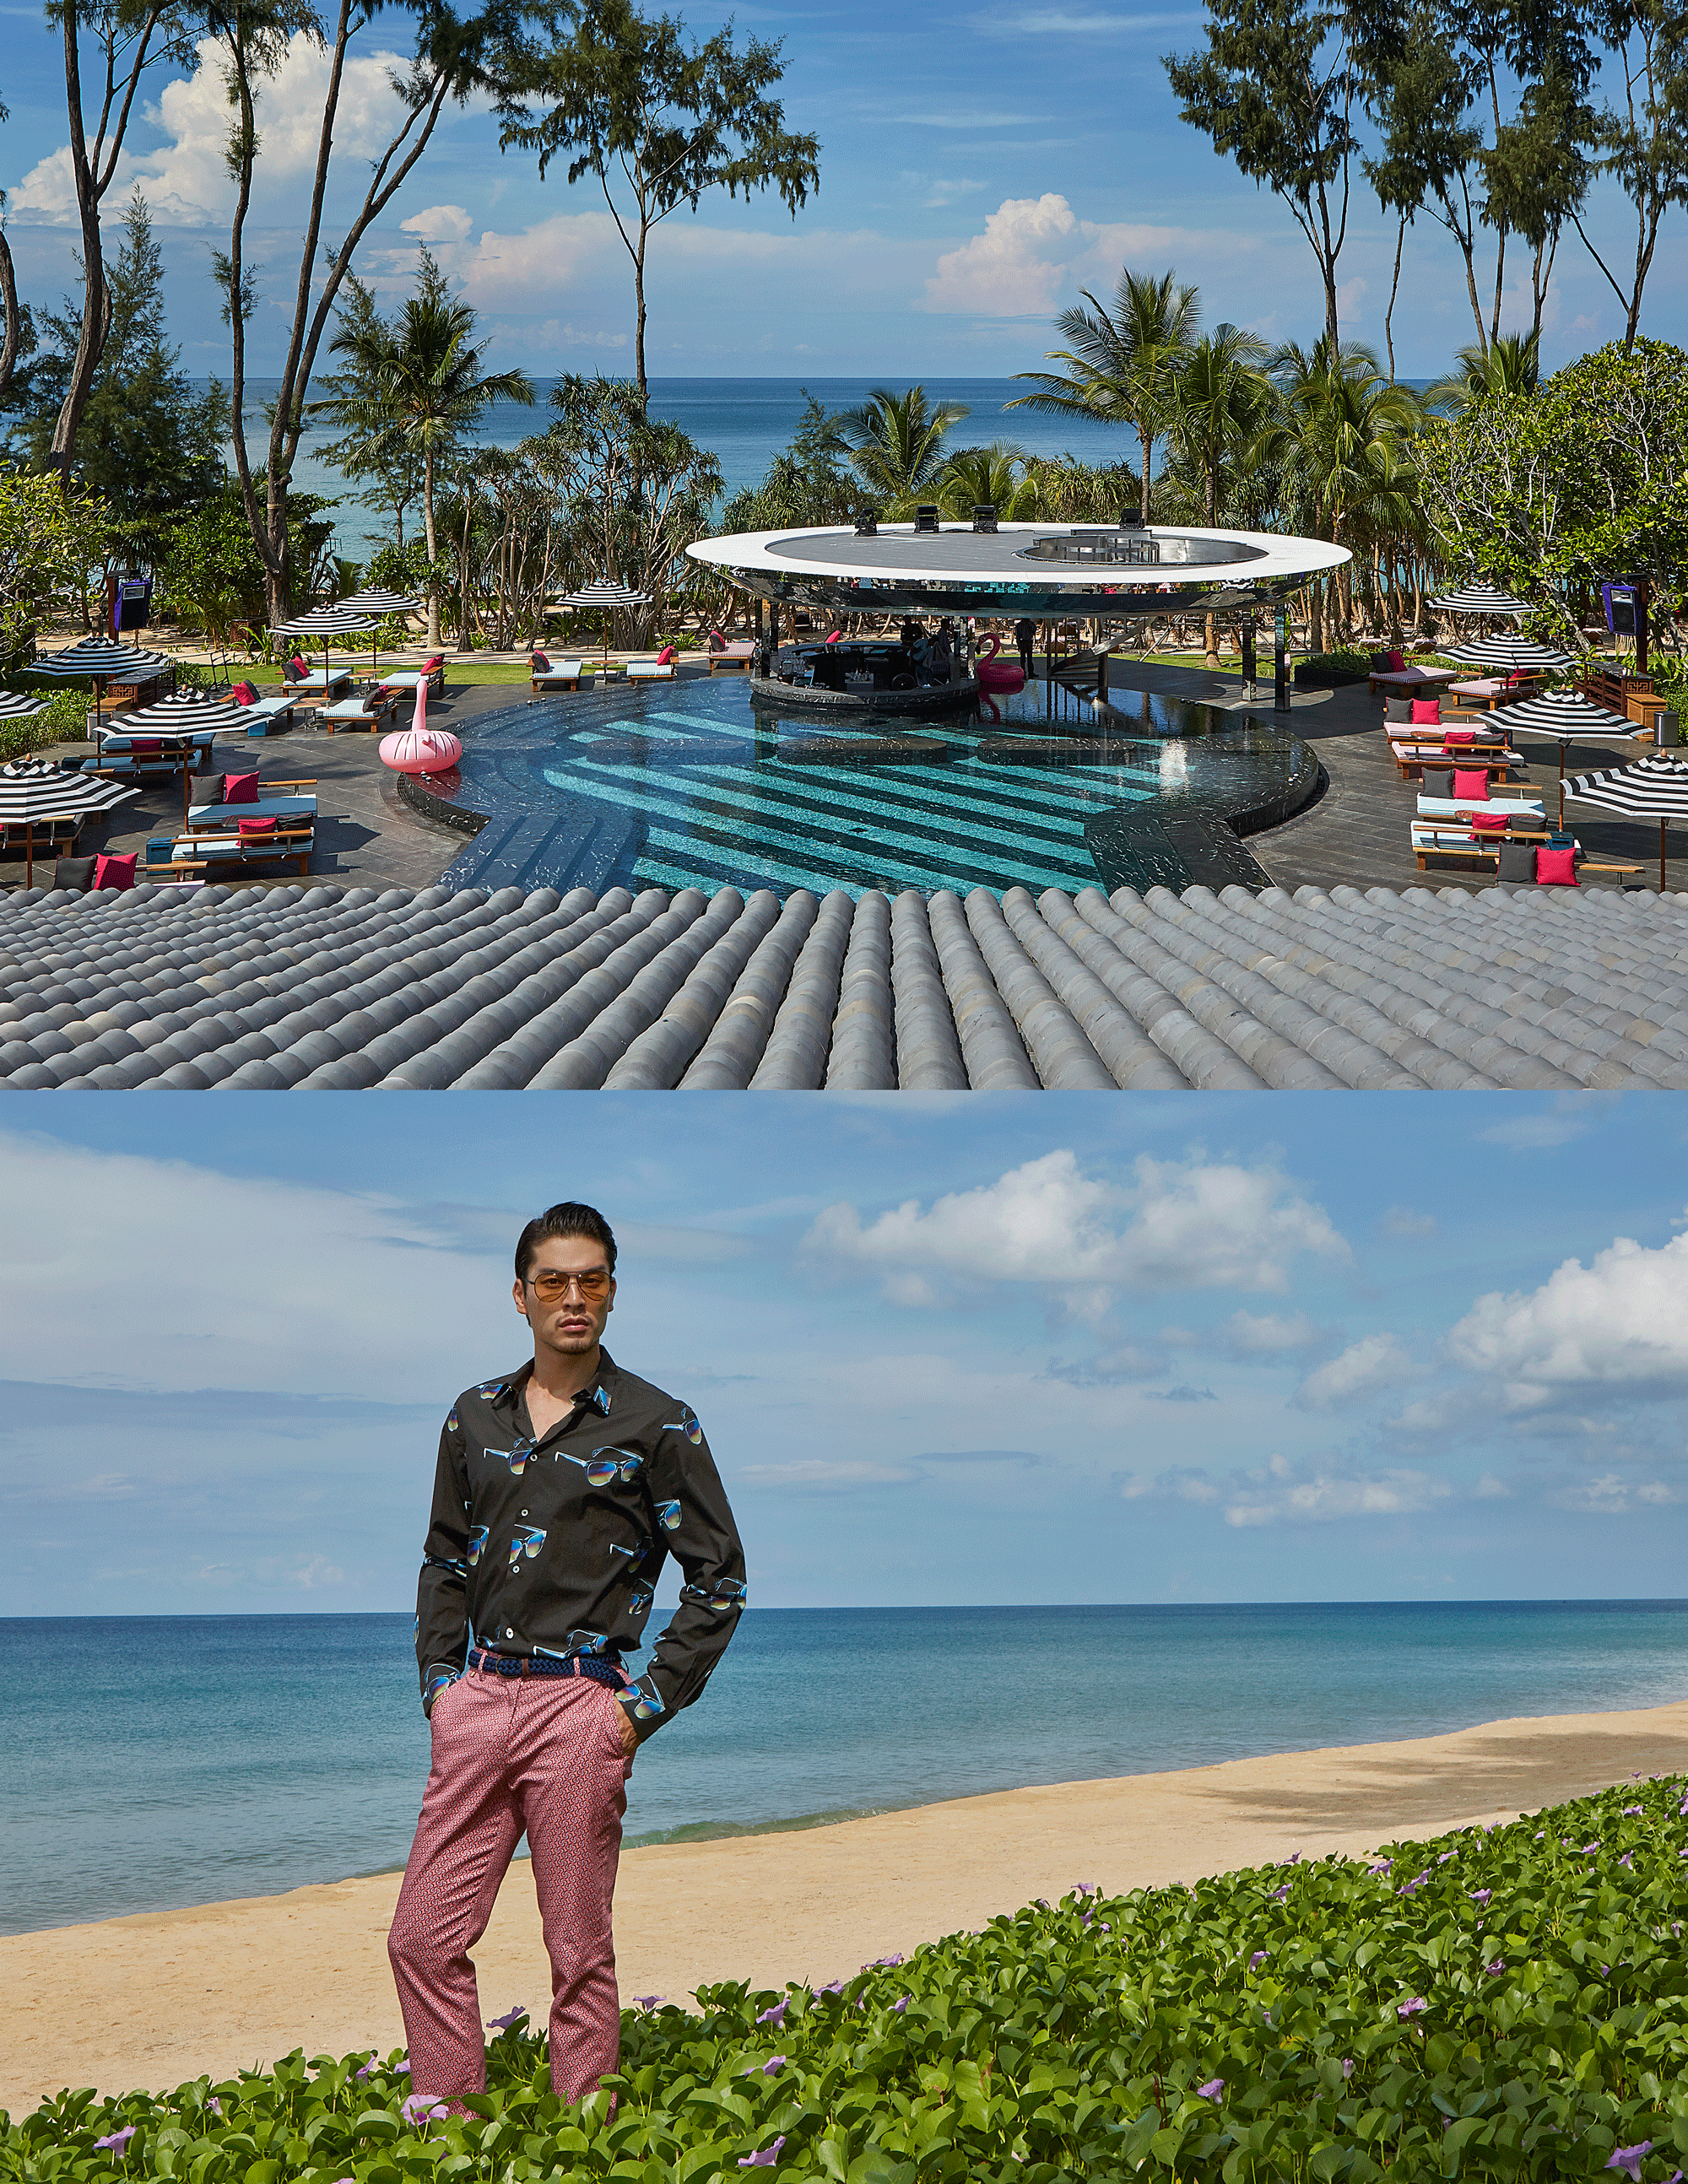 Baba Beach Club, Phuket  Photo : Republic Studio  Model : Victor Chou @vchou13 @redmodelling  Clothes : Paul Smith @club21thailand  Eyewear : TAVAT #tavateyewear  Location : Baba Beach Club, Phuket  88 Moo 5 Khok Klou, Takua Thung, Phang-Nga 82410, THAILAND  Tel +66 76 429 388   www.bababeachclub.com